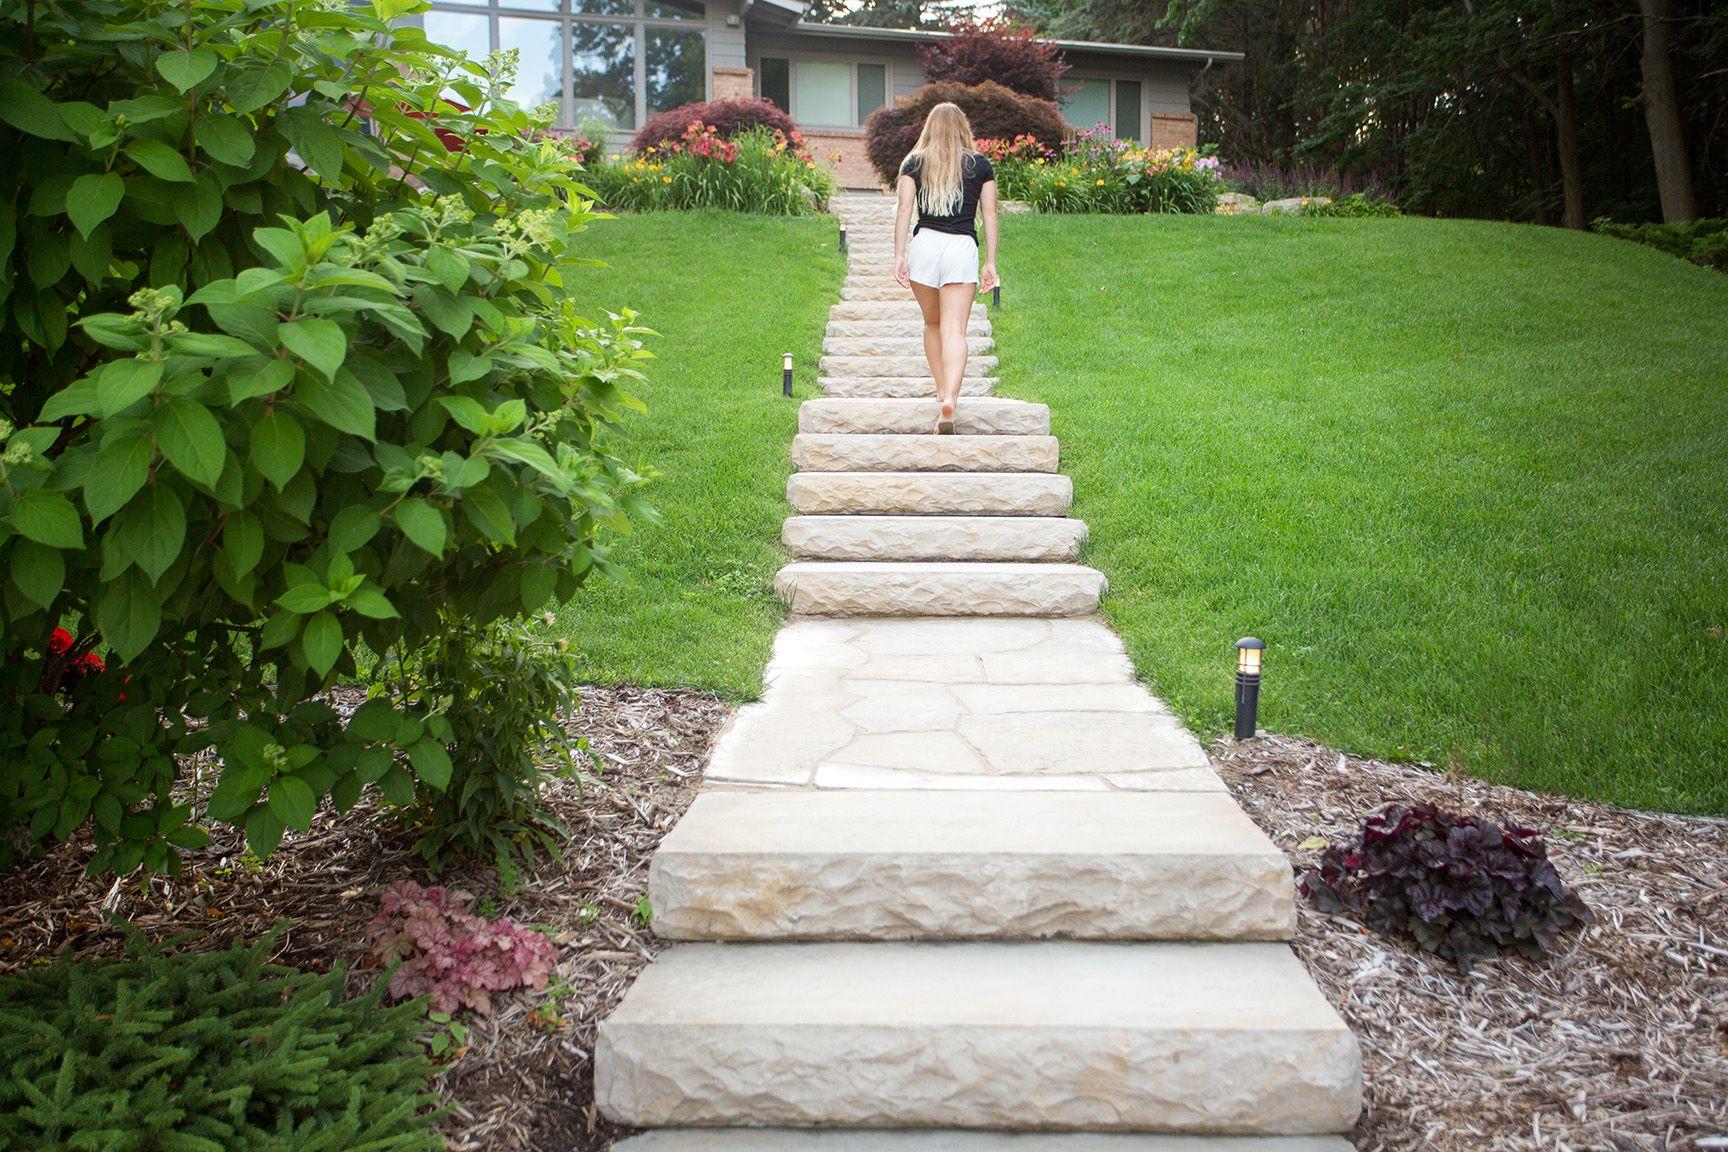 Girl walking up Rosetta Dimensional Step stairway